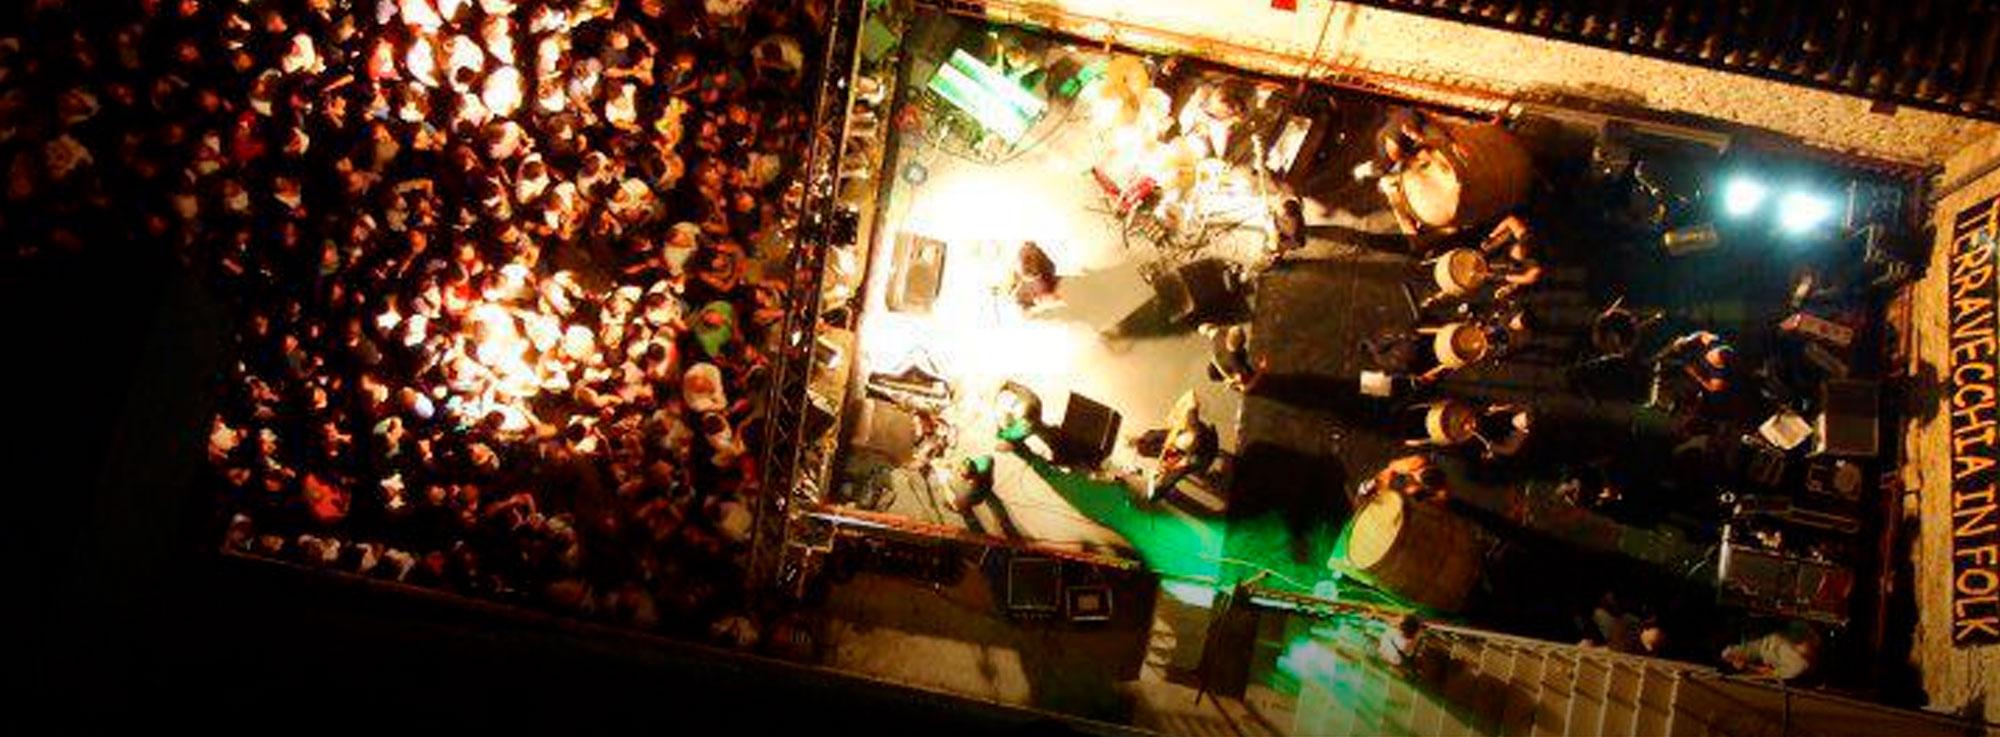 Pietramontecorvino: Terravecchia festival